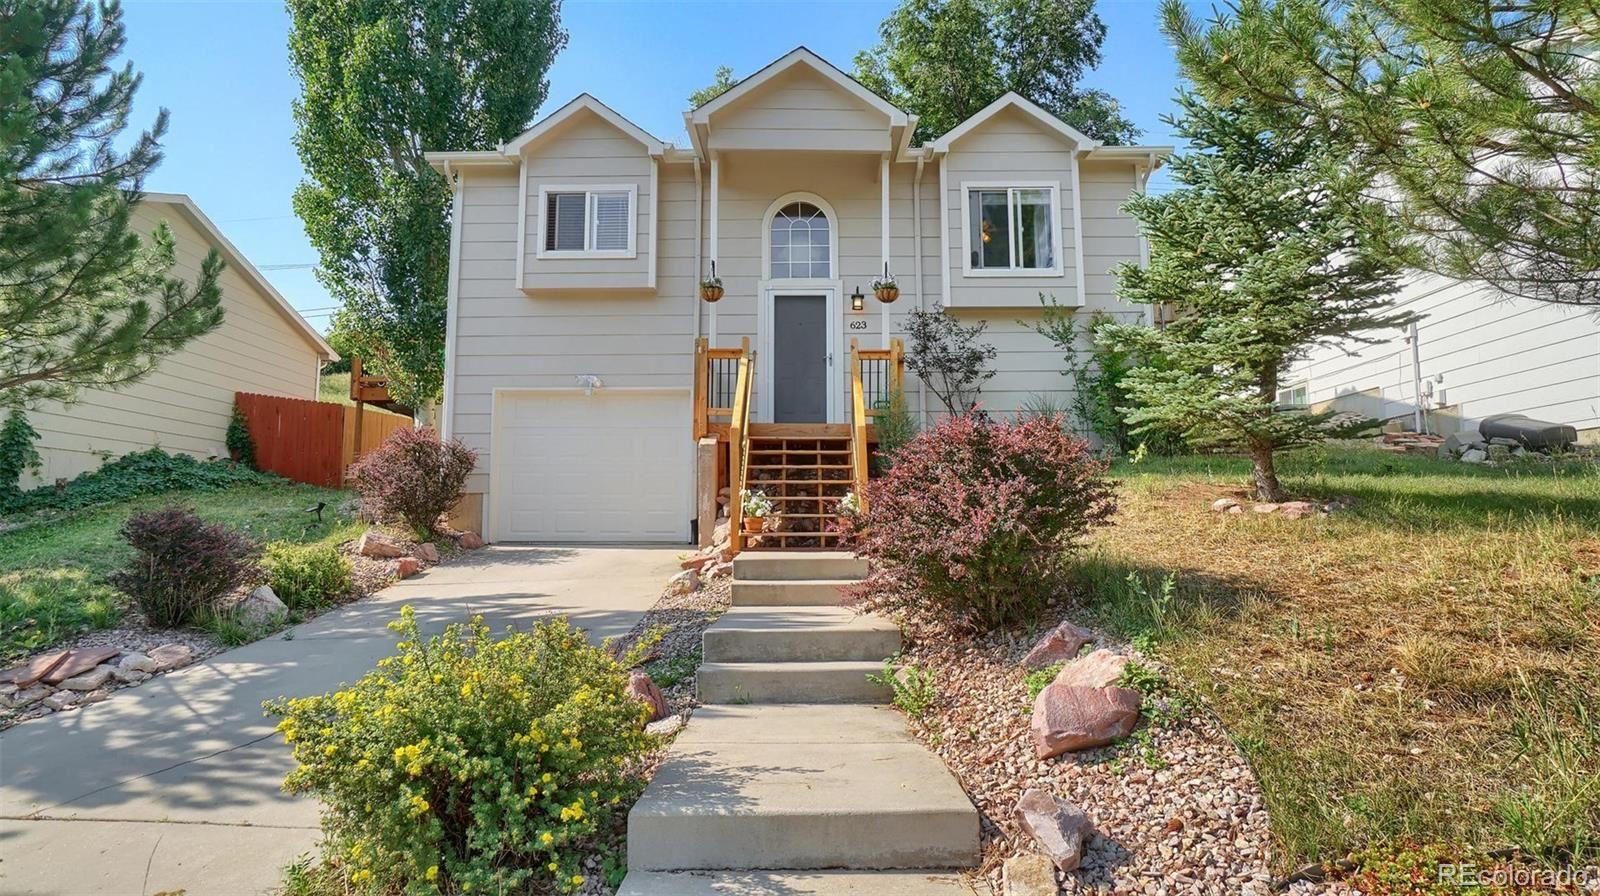 623 W Monument Street, Colorado Springs, CO 80905 - #: 4961798